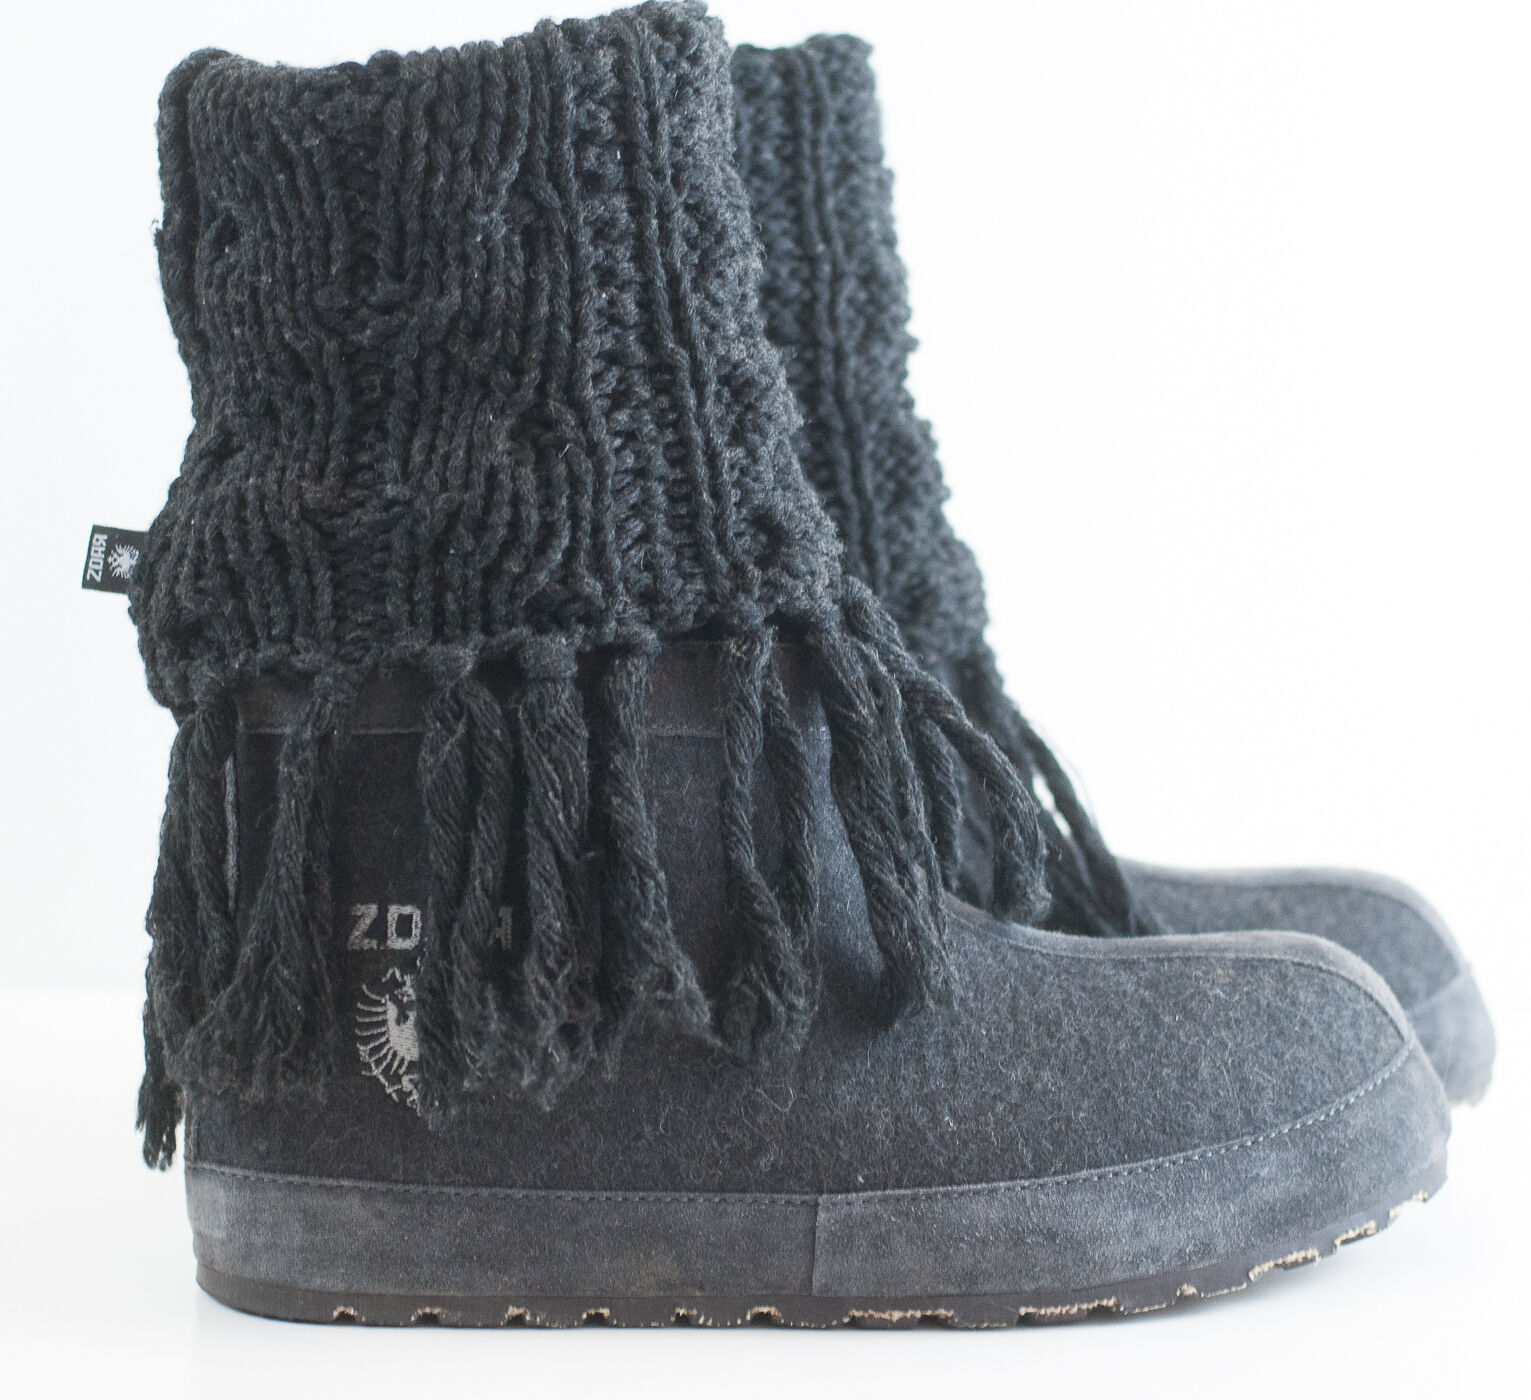 ZDAR Masha High Knit Lambswool Wool Hemp Winter Snow Boots Sz 41/US 11 Handmade